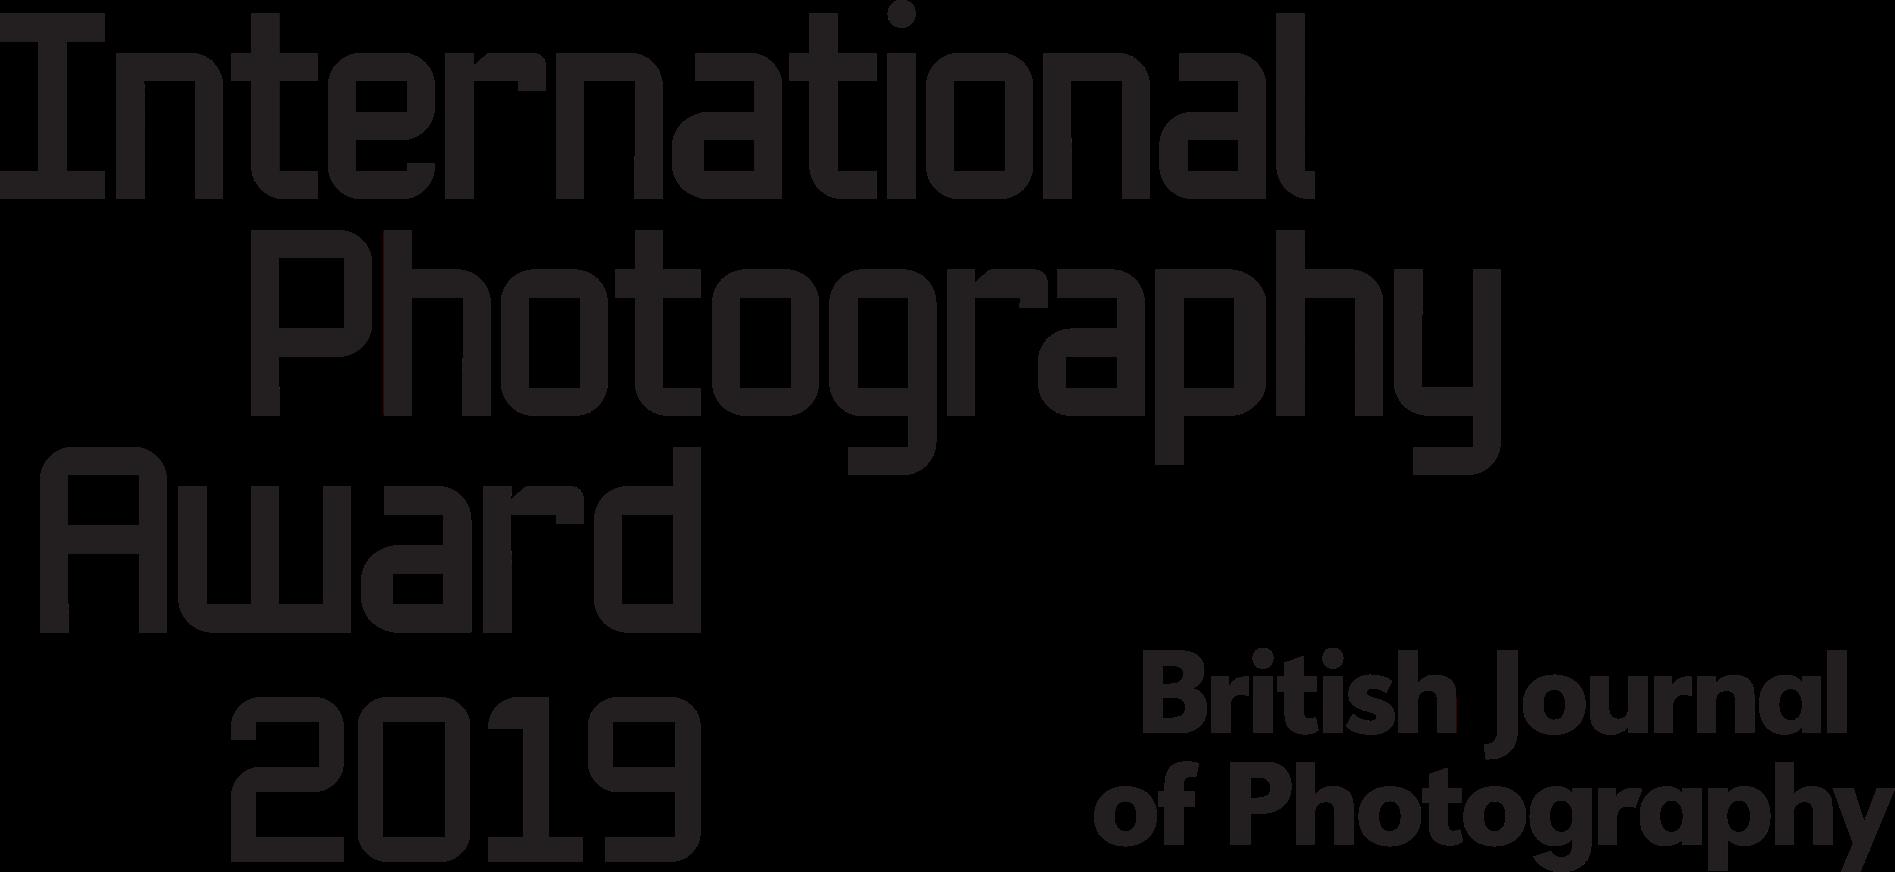 BJP International Photography Award 2019 - logo